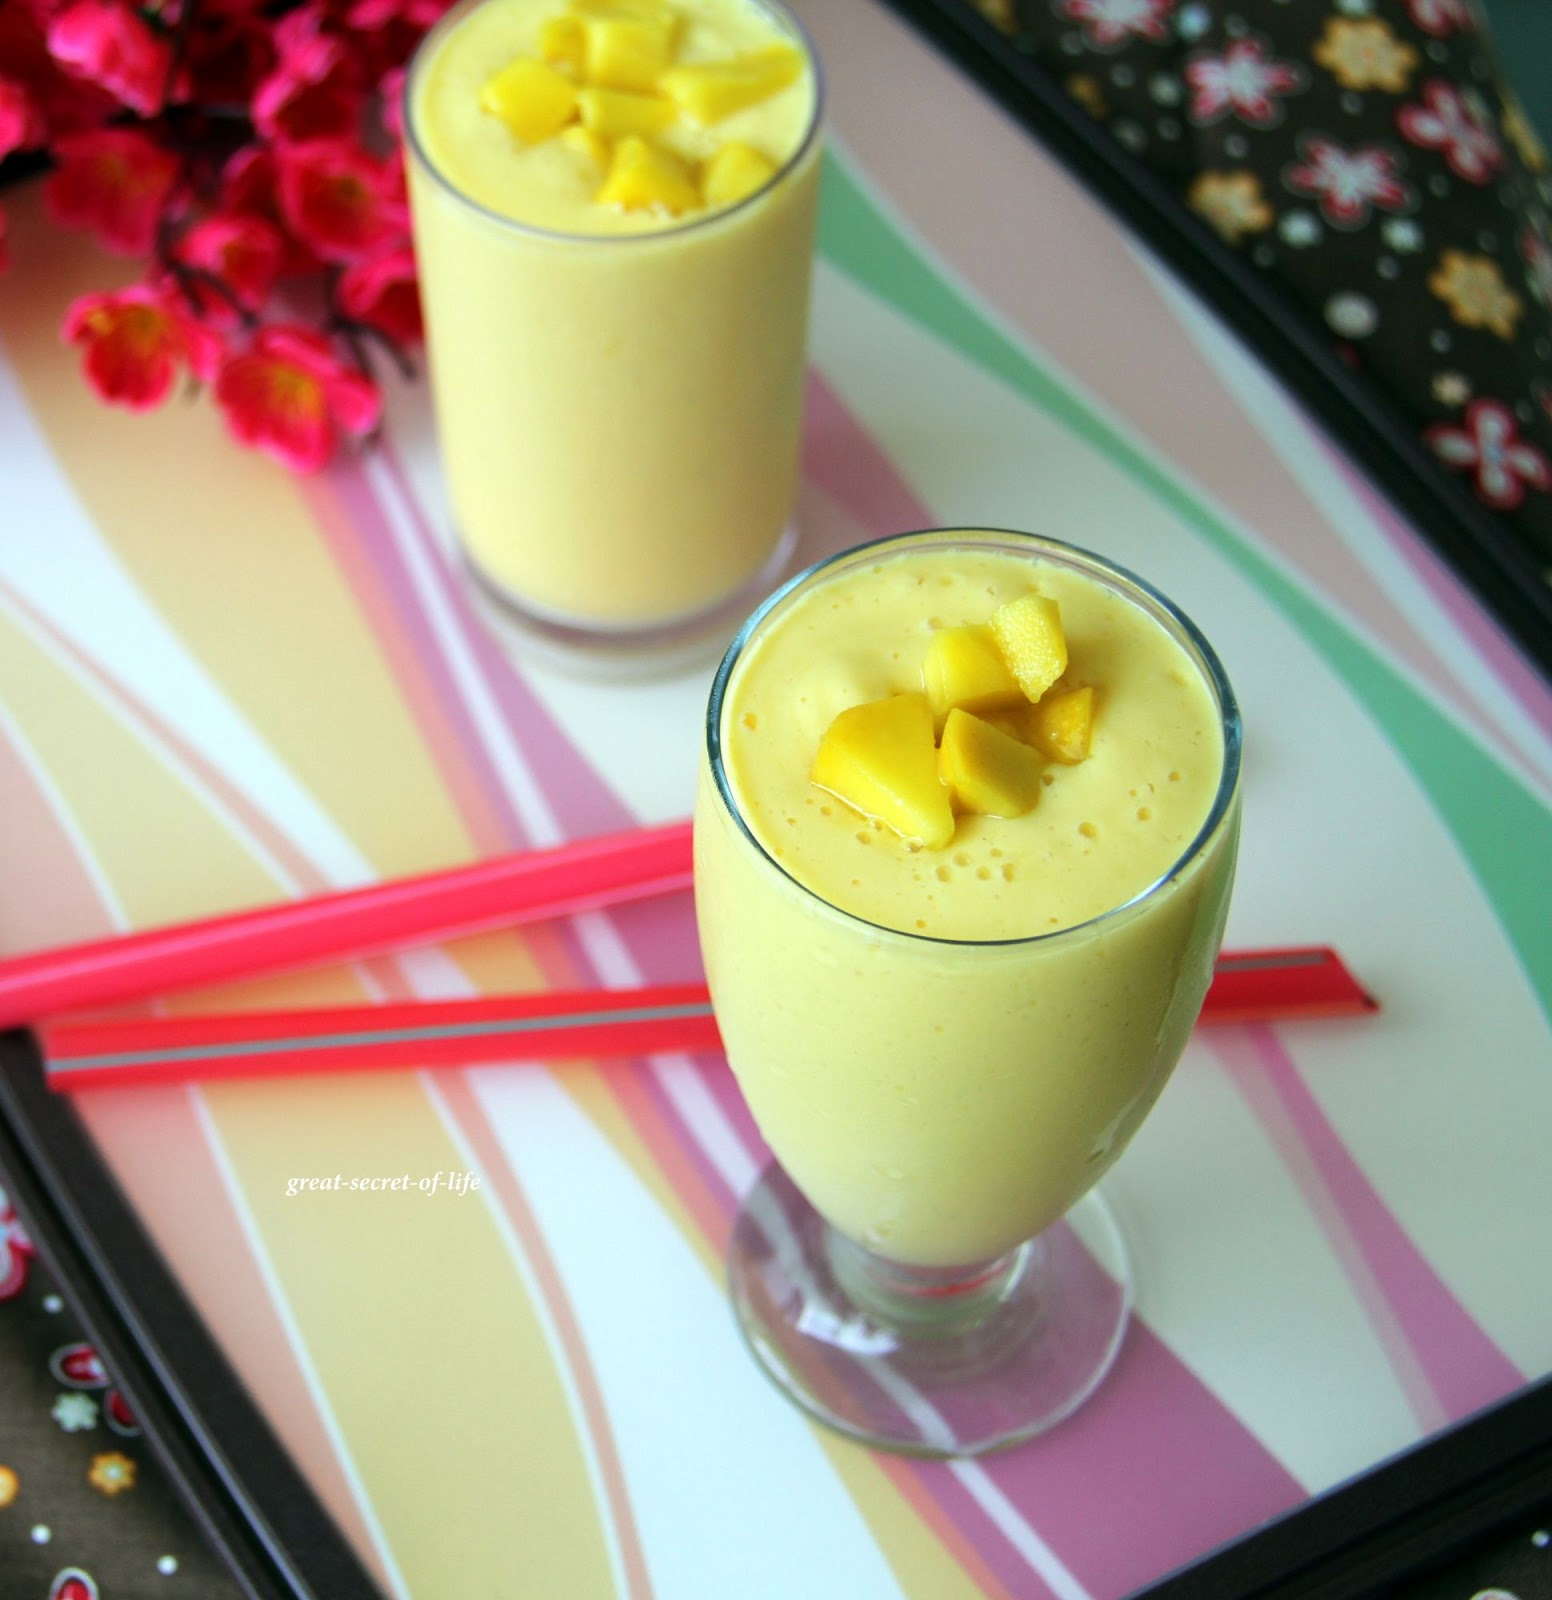 Great-secret-of-life: Mango Lassi - Mango Yogurt drink